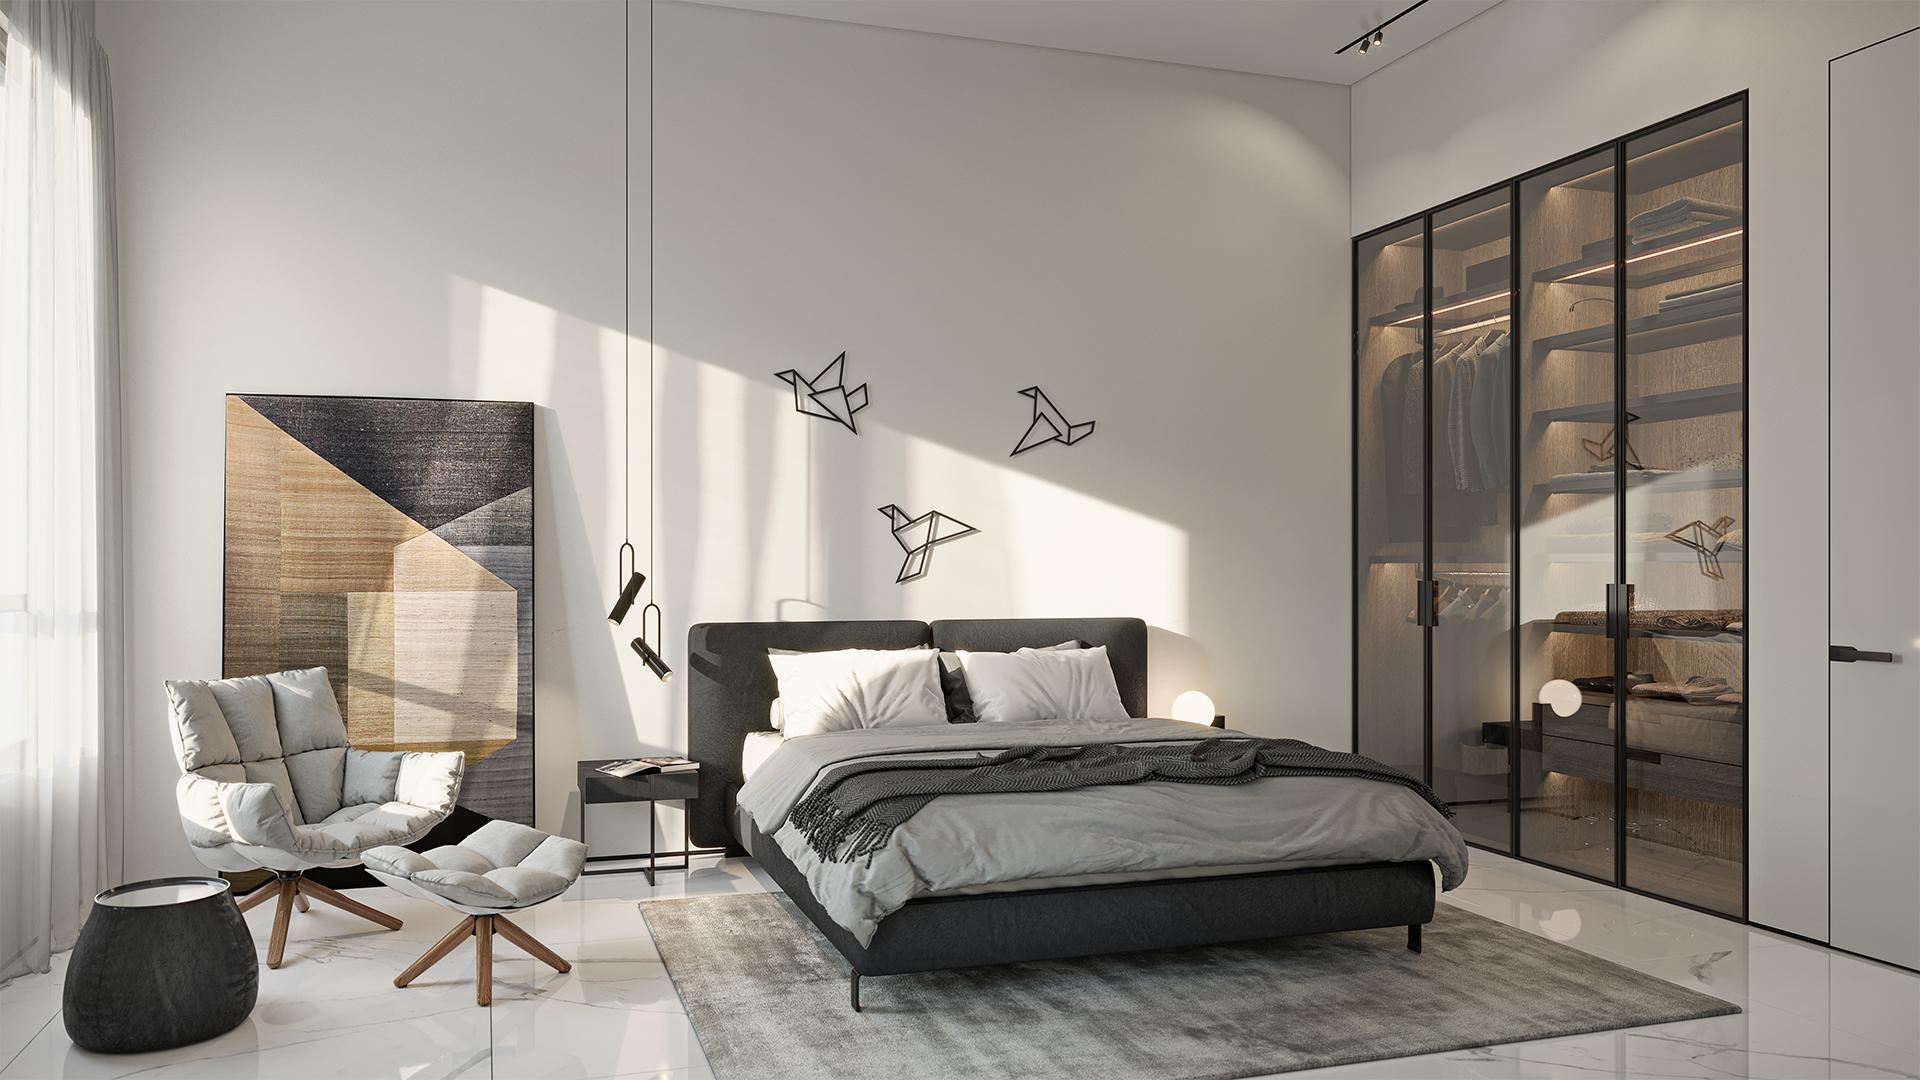 Maayan-Golan_Architectural-Visualization_interior-visualization_penthouse-apartment_guest-room_design-by-elad-ben-nahmias_01